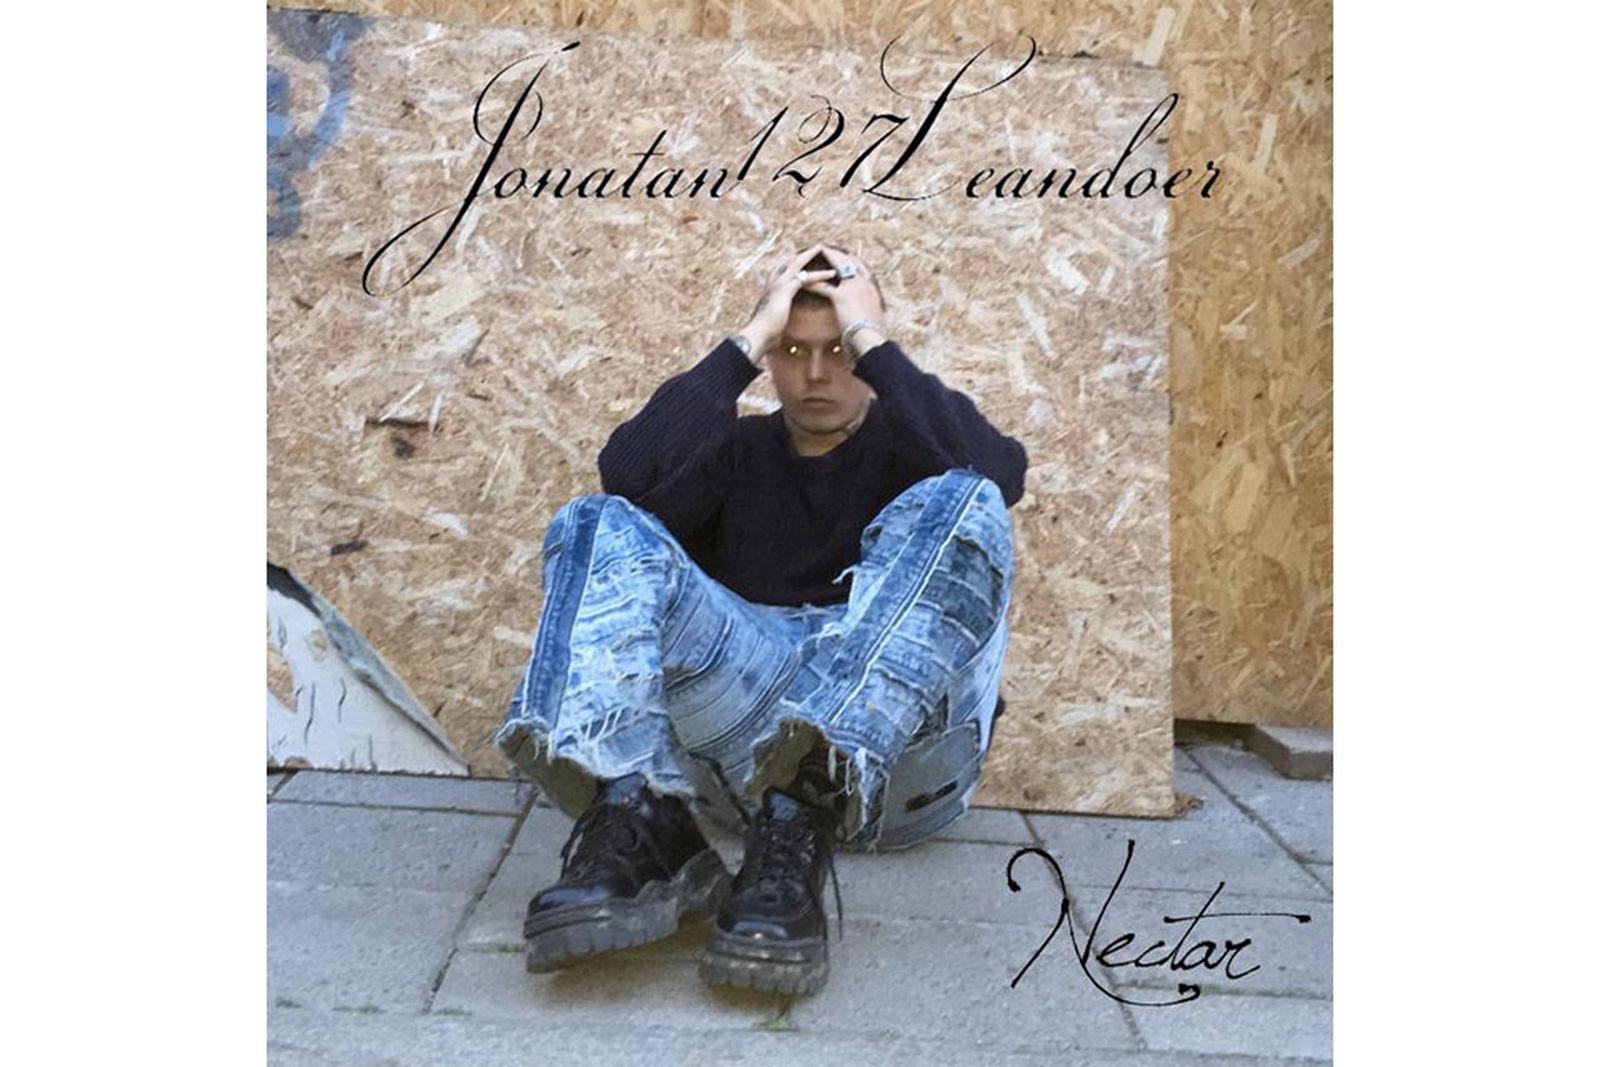 jonatan leandoer127 nectar review